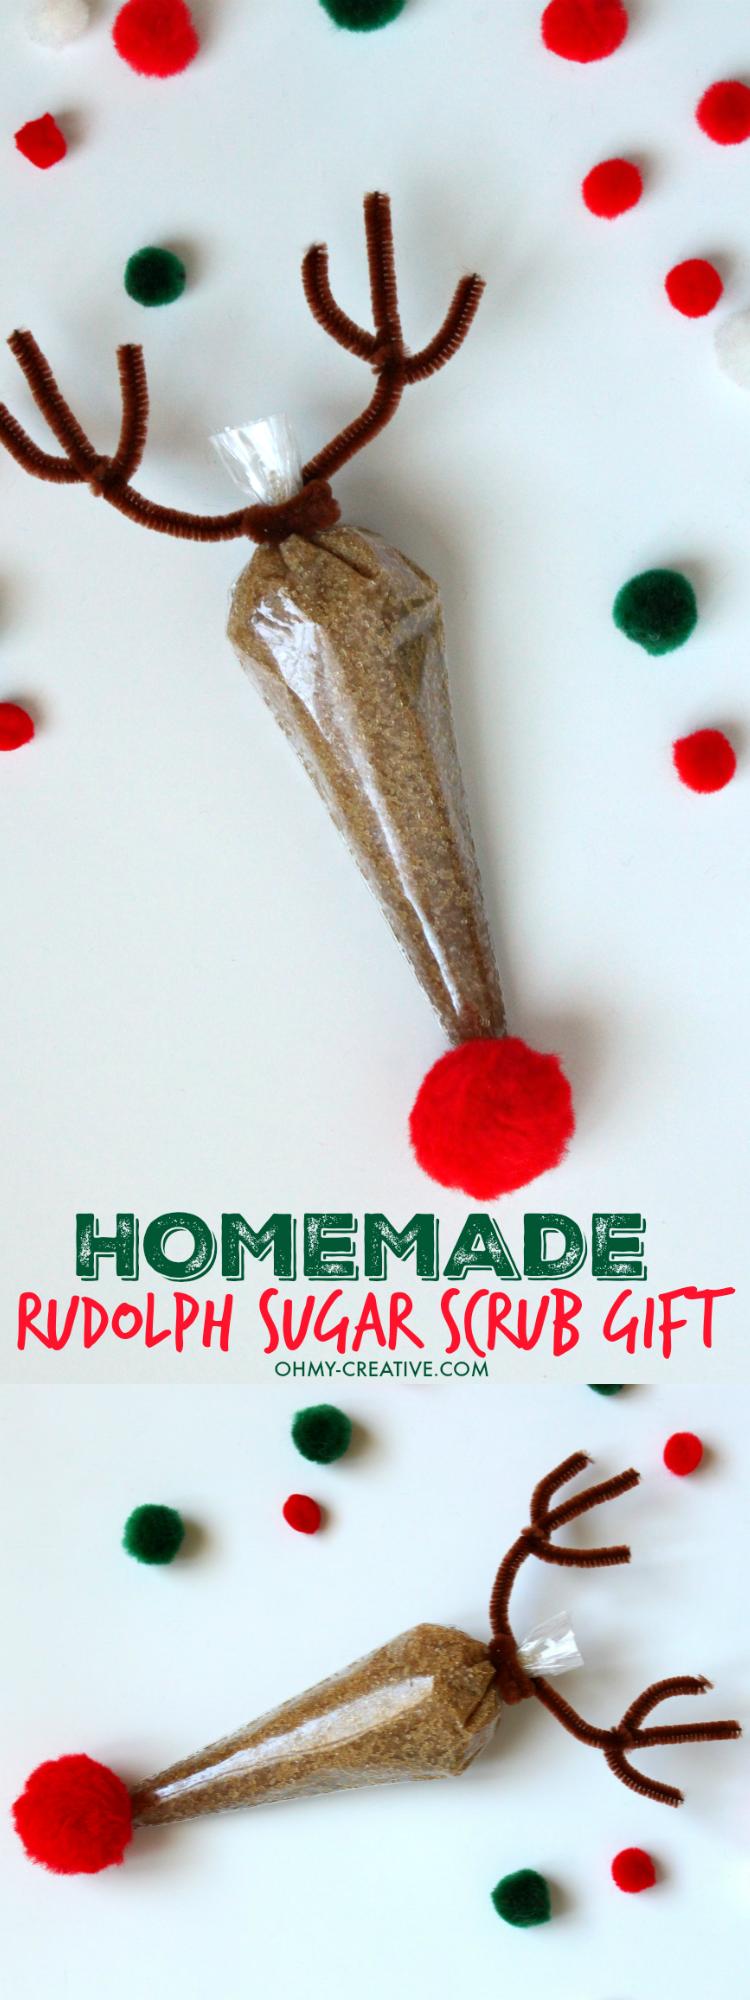 Homemade-Rudolph-Sugar-Scrub-Gift-Using-Essential-Oils-OHMY-CREATIVE.COM-c